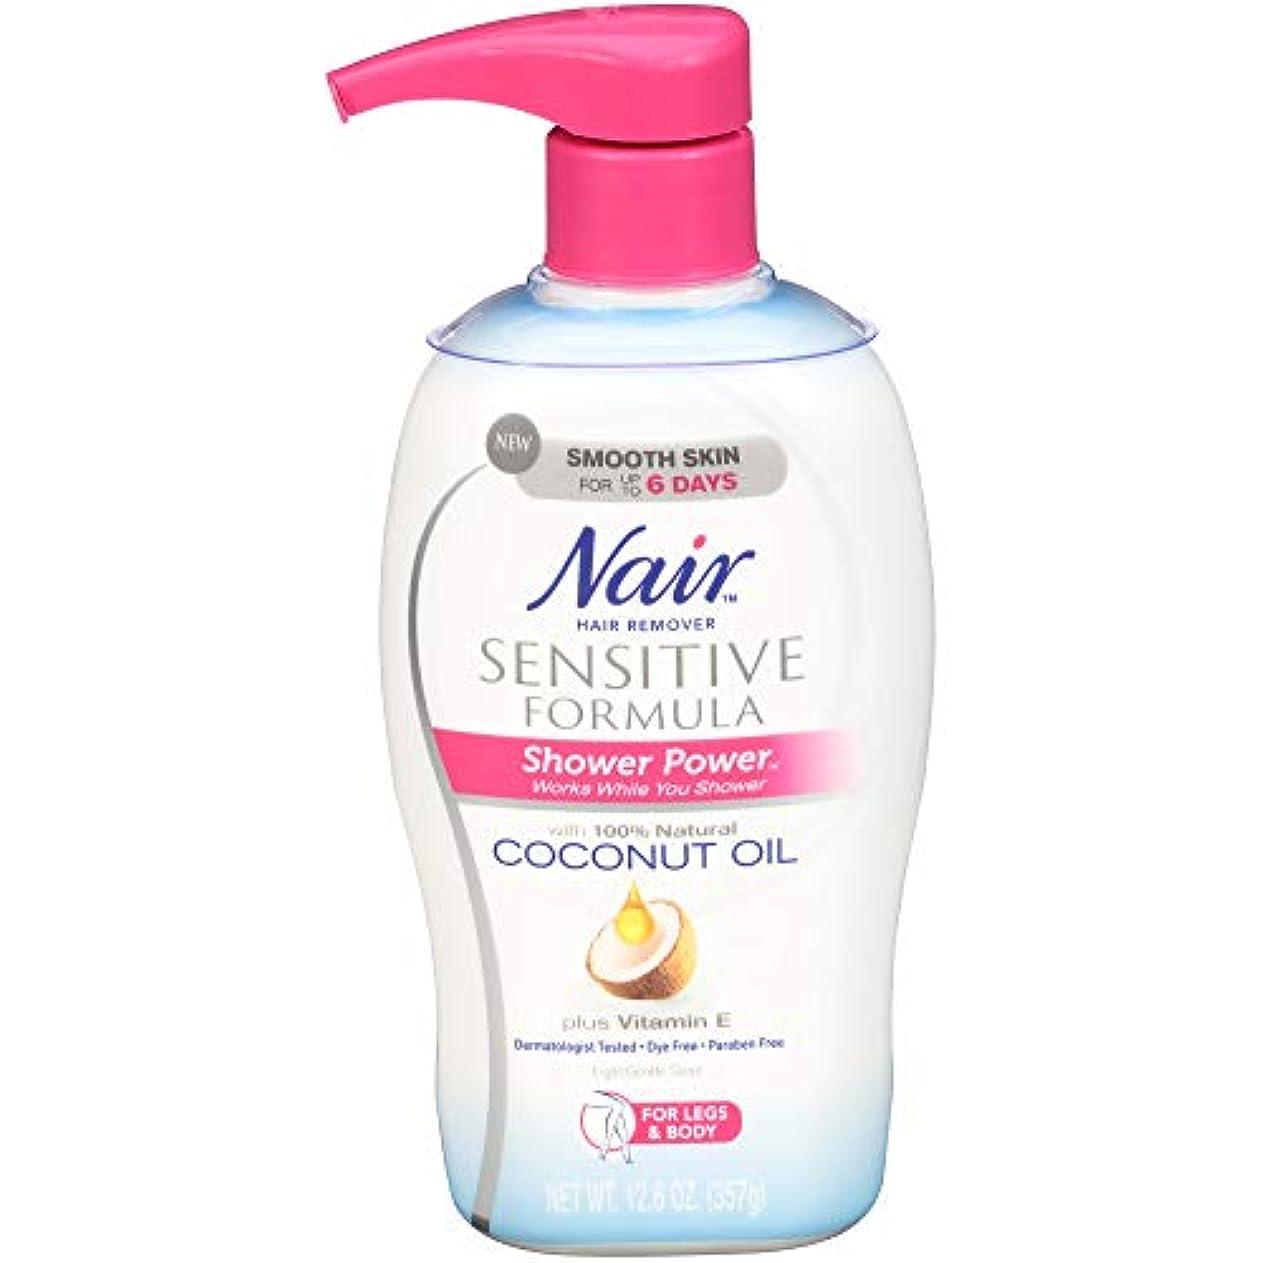 Nair 美脚ボディのためのシャワーパワー敏感脱毛、12.6液量オンス